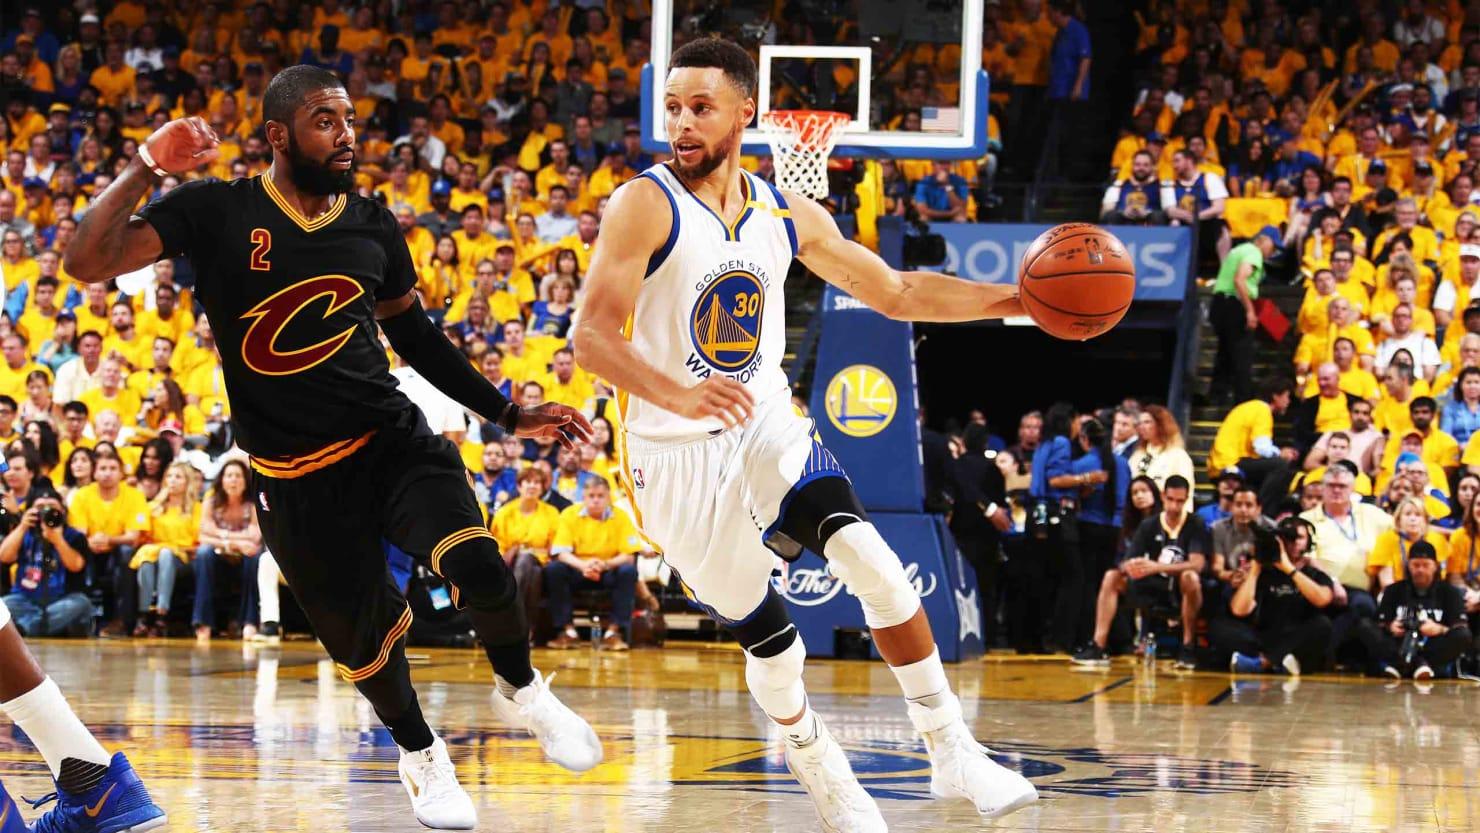 Nba Finals Game 5 Highlights 2018 | Basketball Scores